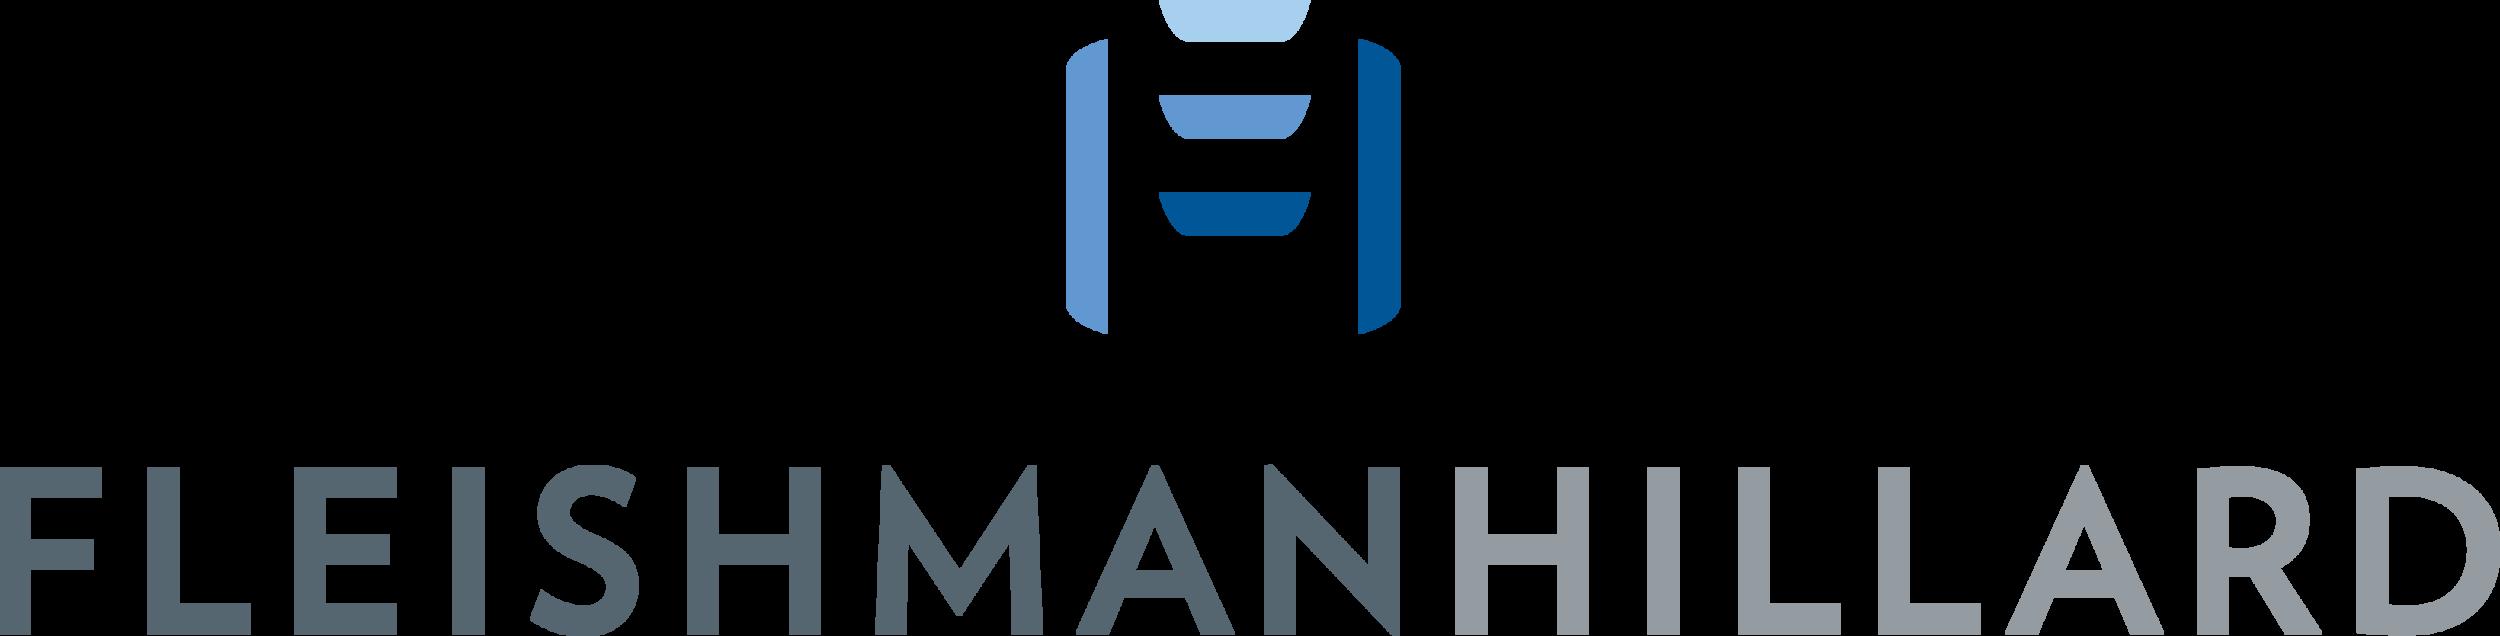 FleishmanHillard (web).png